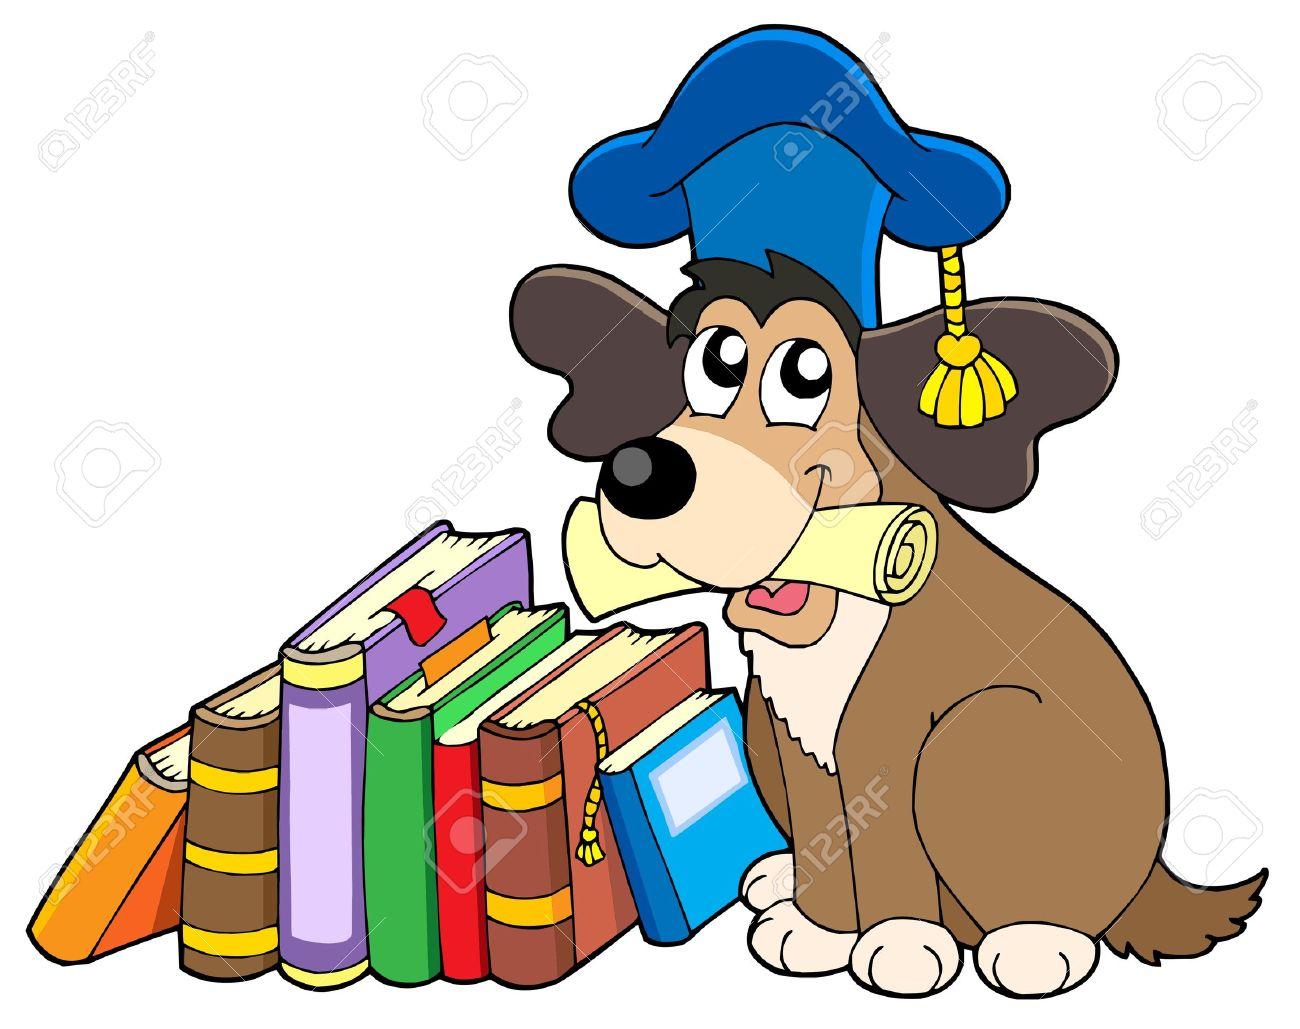 dog teacher with books - vector illustration. royalty free